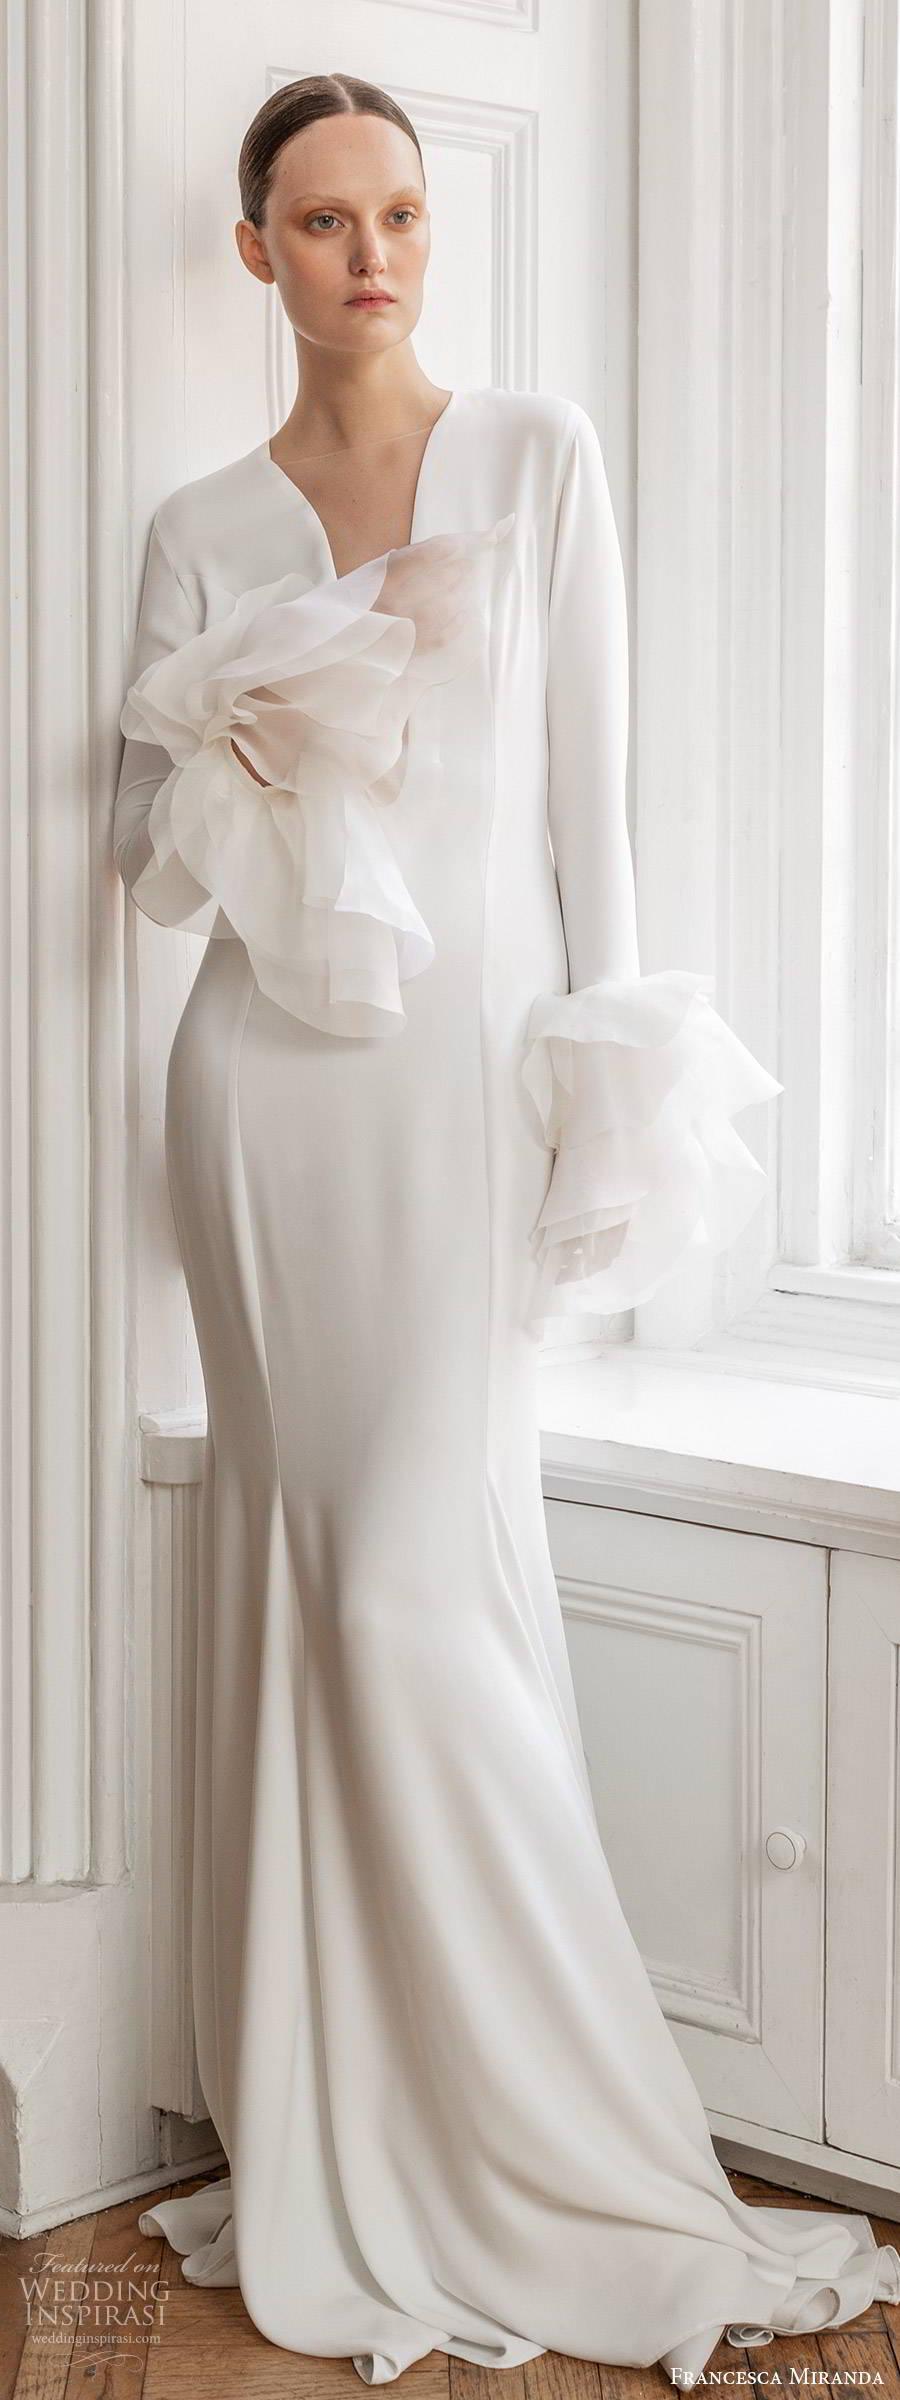 francesca miranda spring 2020 bridal long bell sleeves plunging neckline clean sheath mermaid wedding dress ruffle modern minimalist elegant sweep train (9) mv